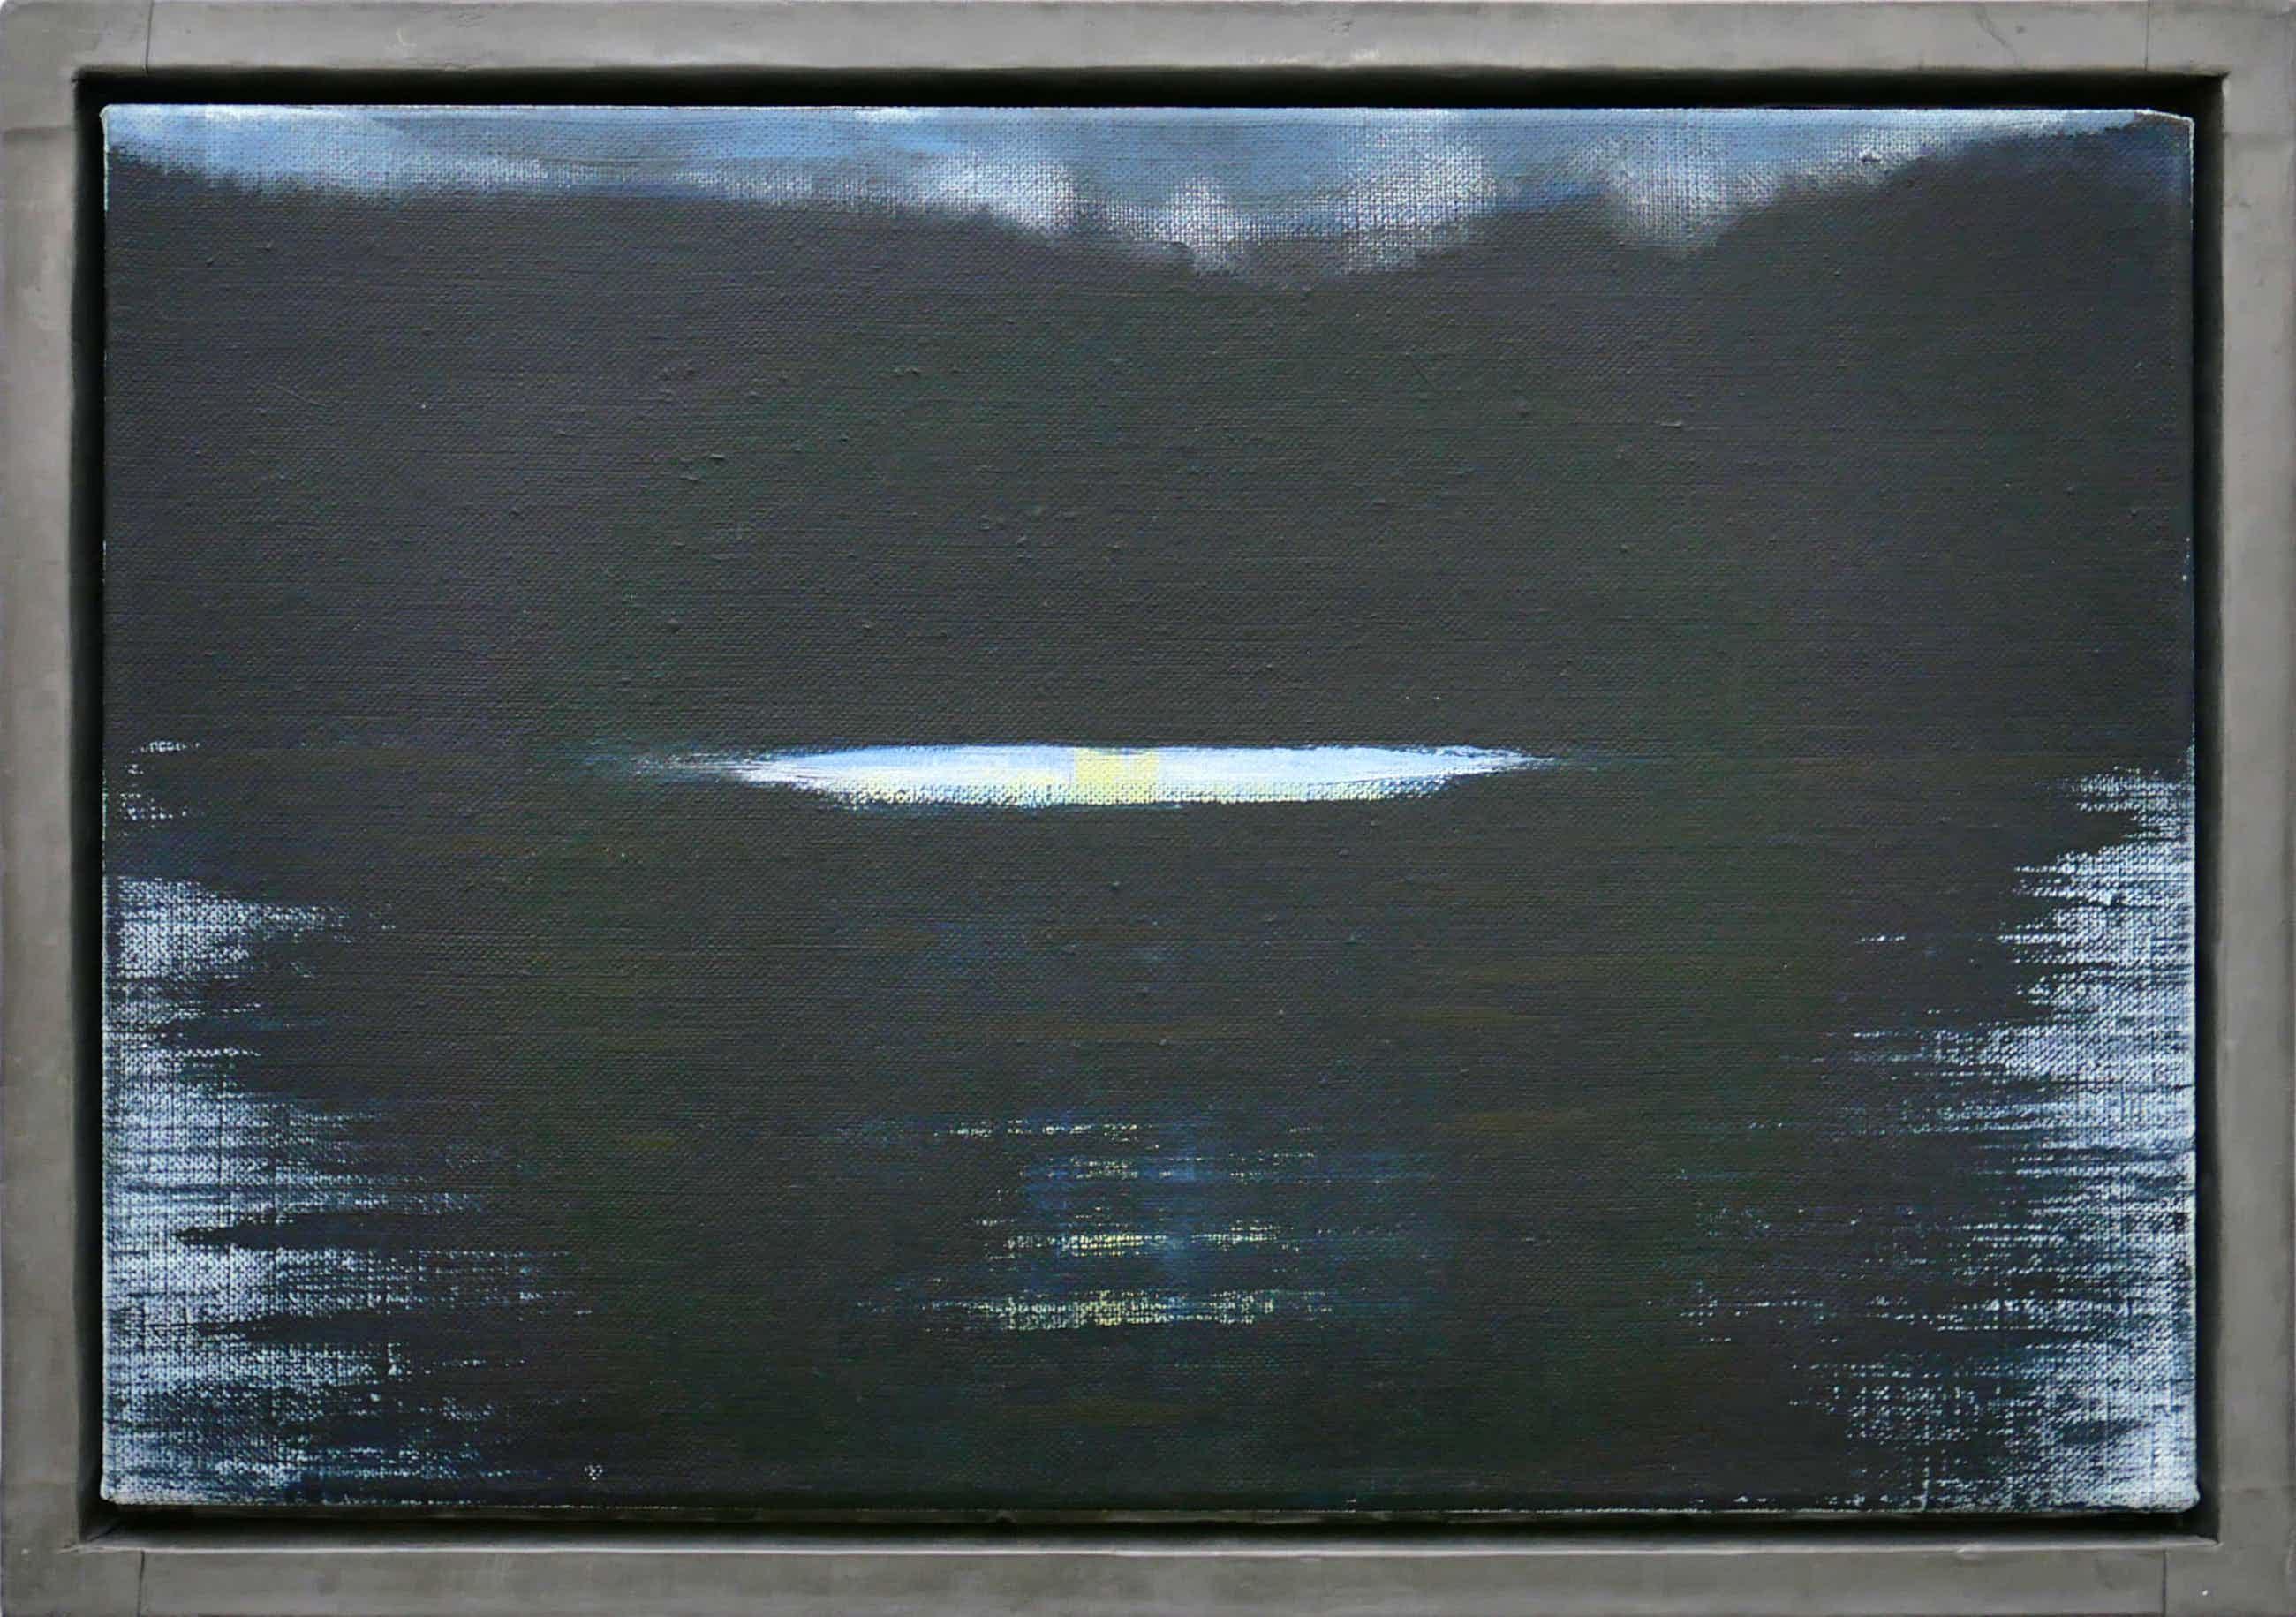 Paul Corvers - Black Water (475) kopen? Bied vanaf 140!